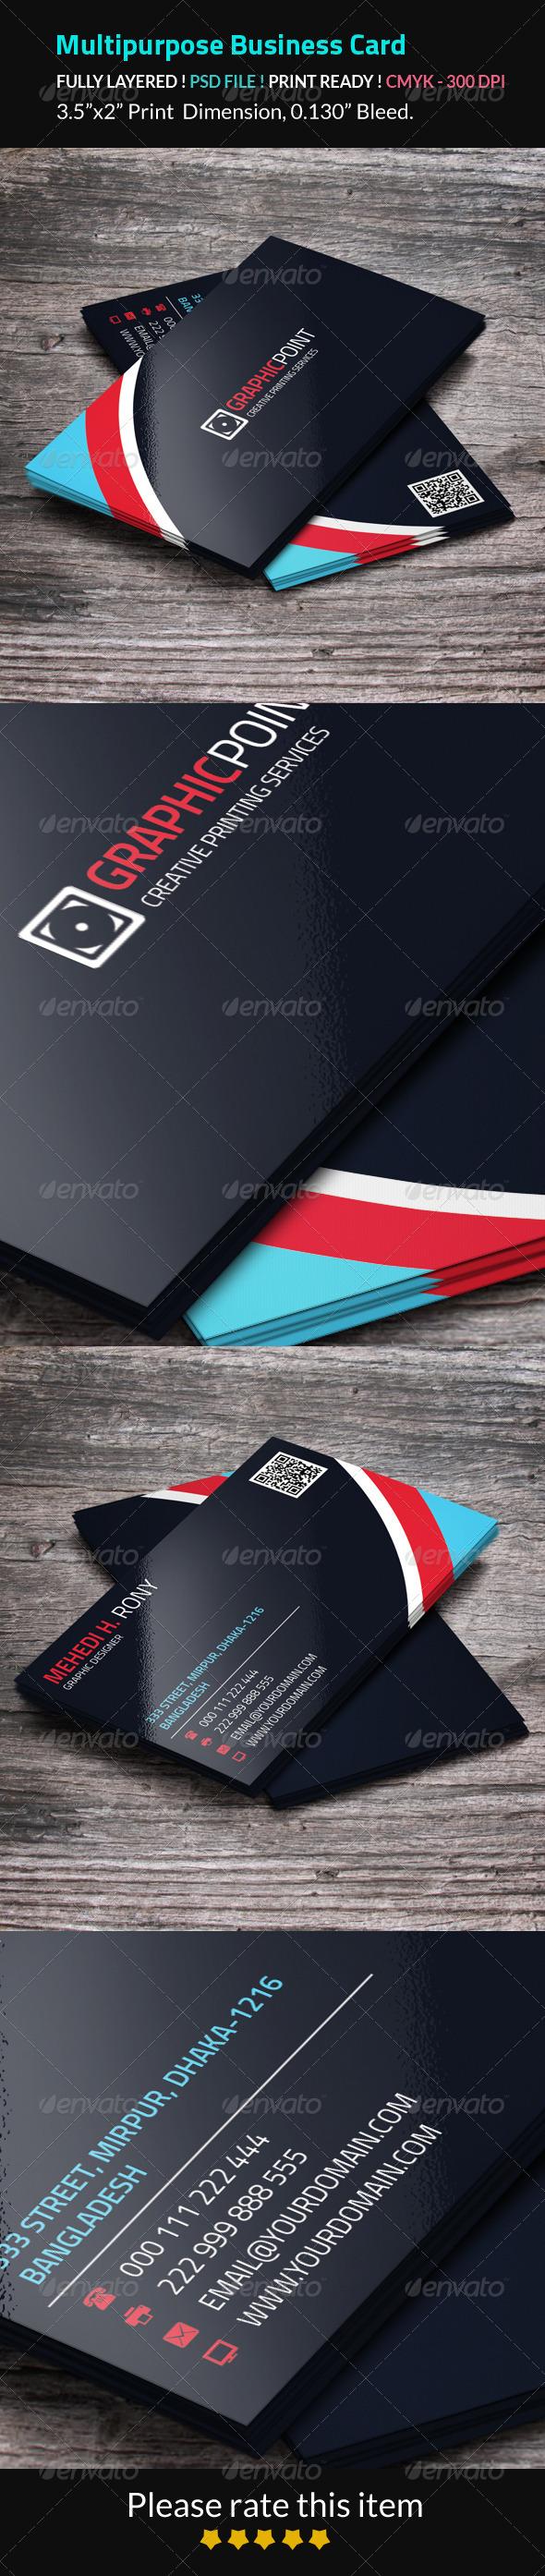 GraphicRiver Multipurpose Business Card 8258431